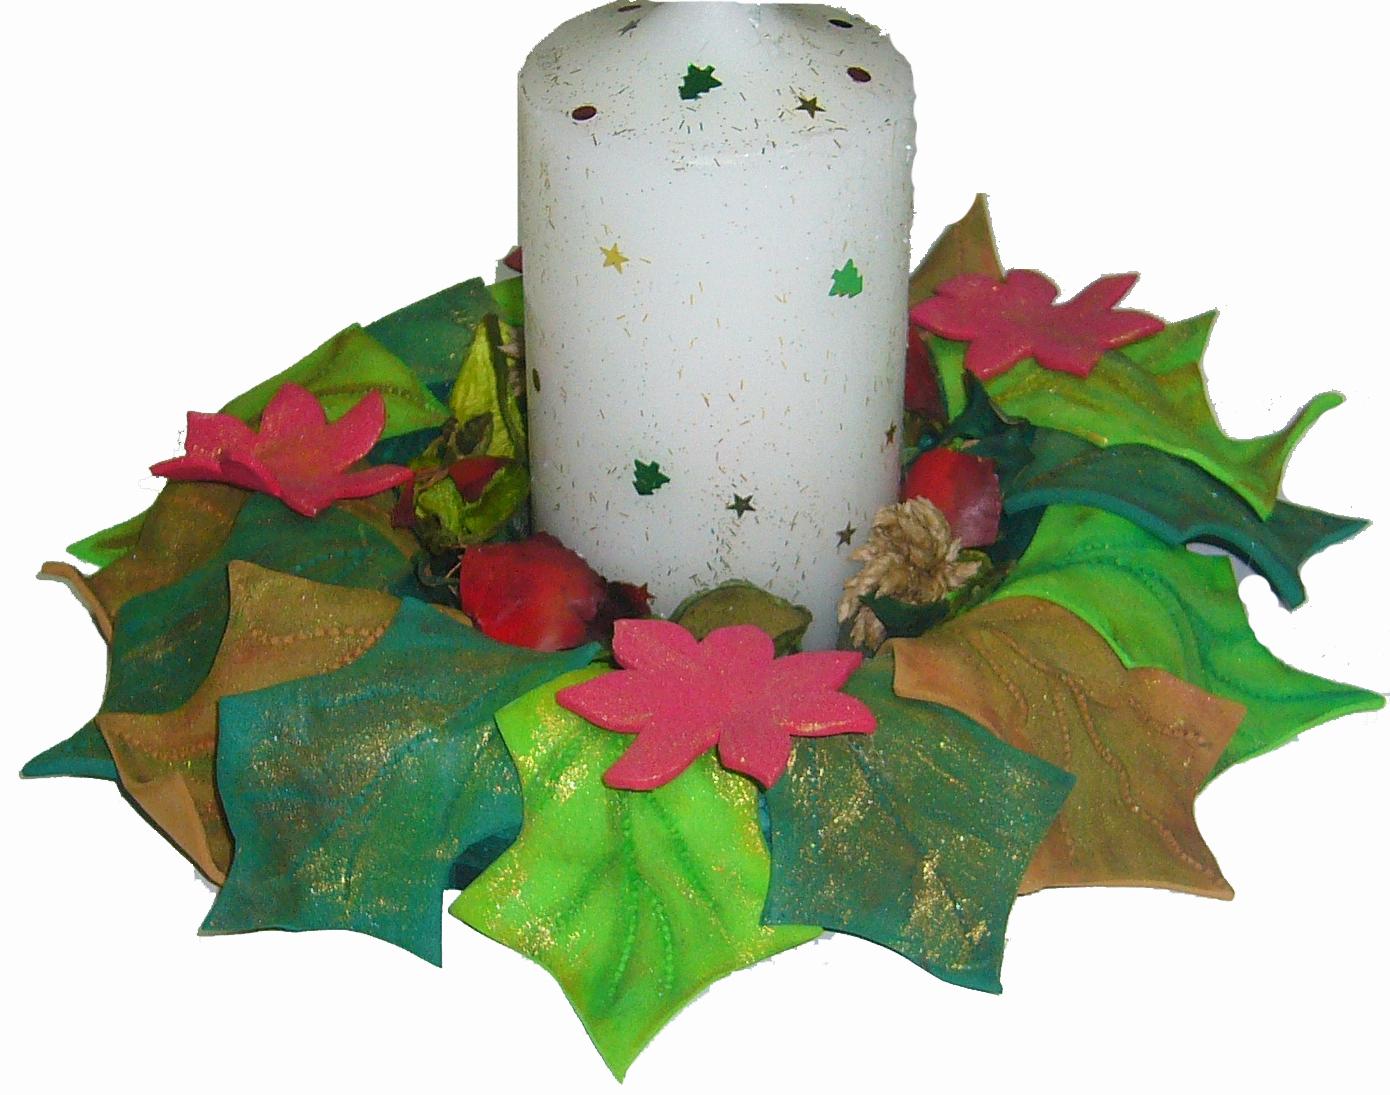 Amigos del foamy taller creativo detalles para navidad for Detalles para navidad